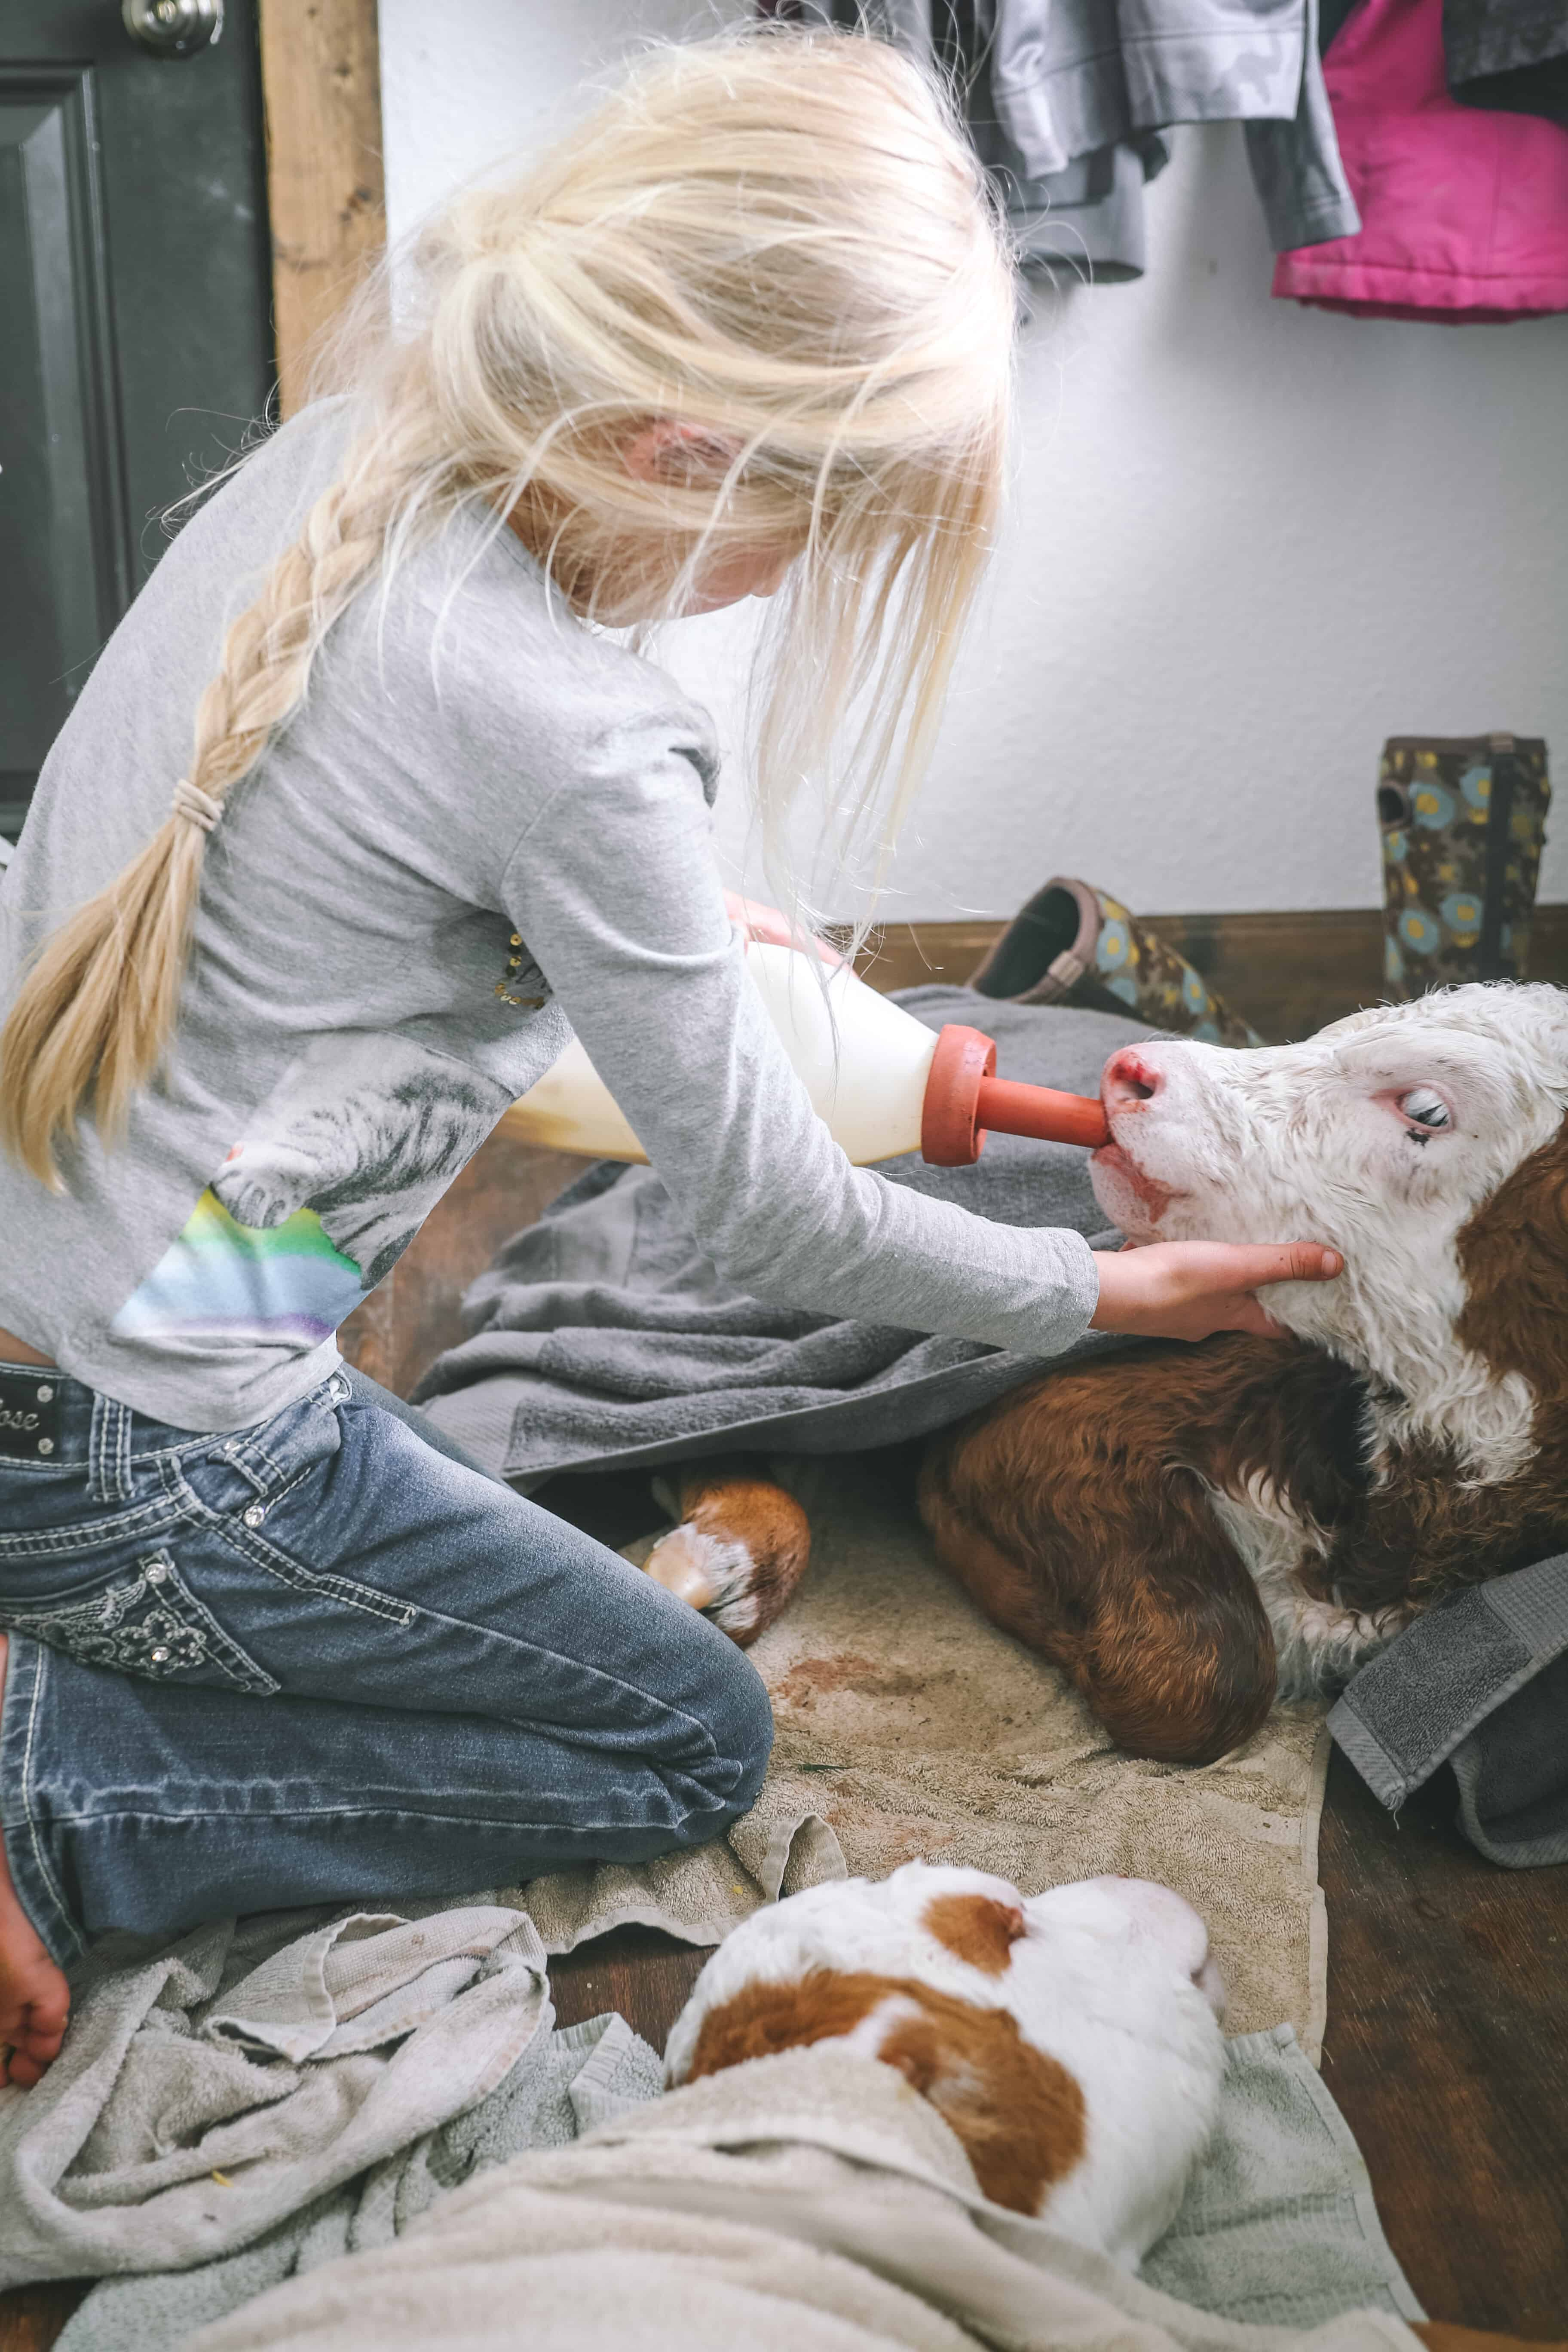 newborn calf in mudroom drinking bottle